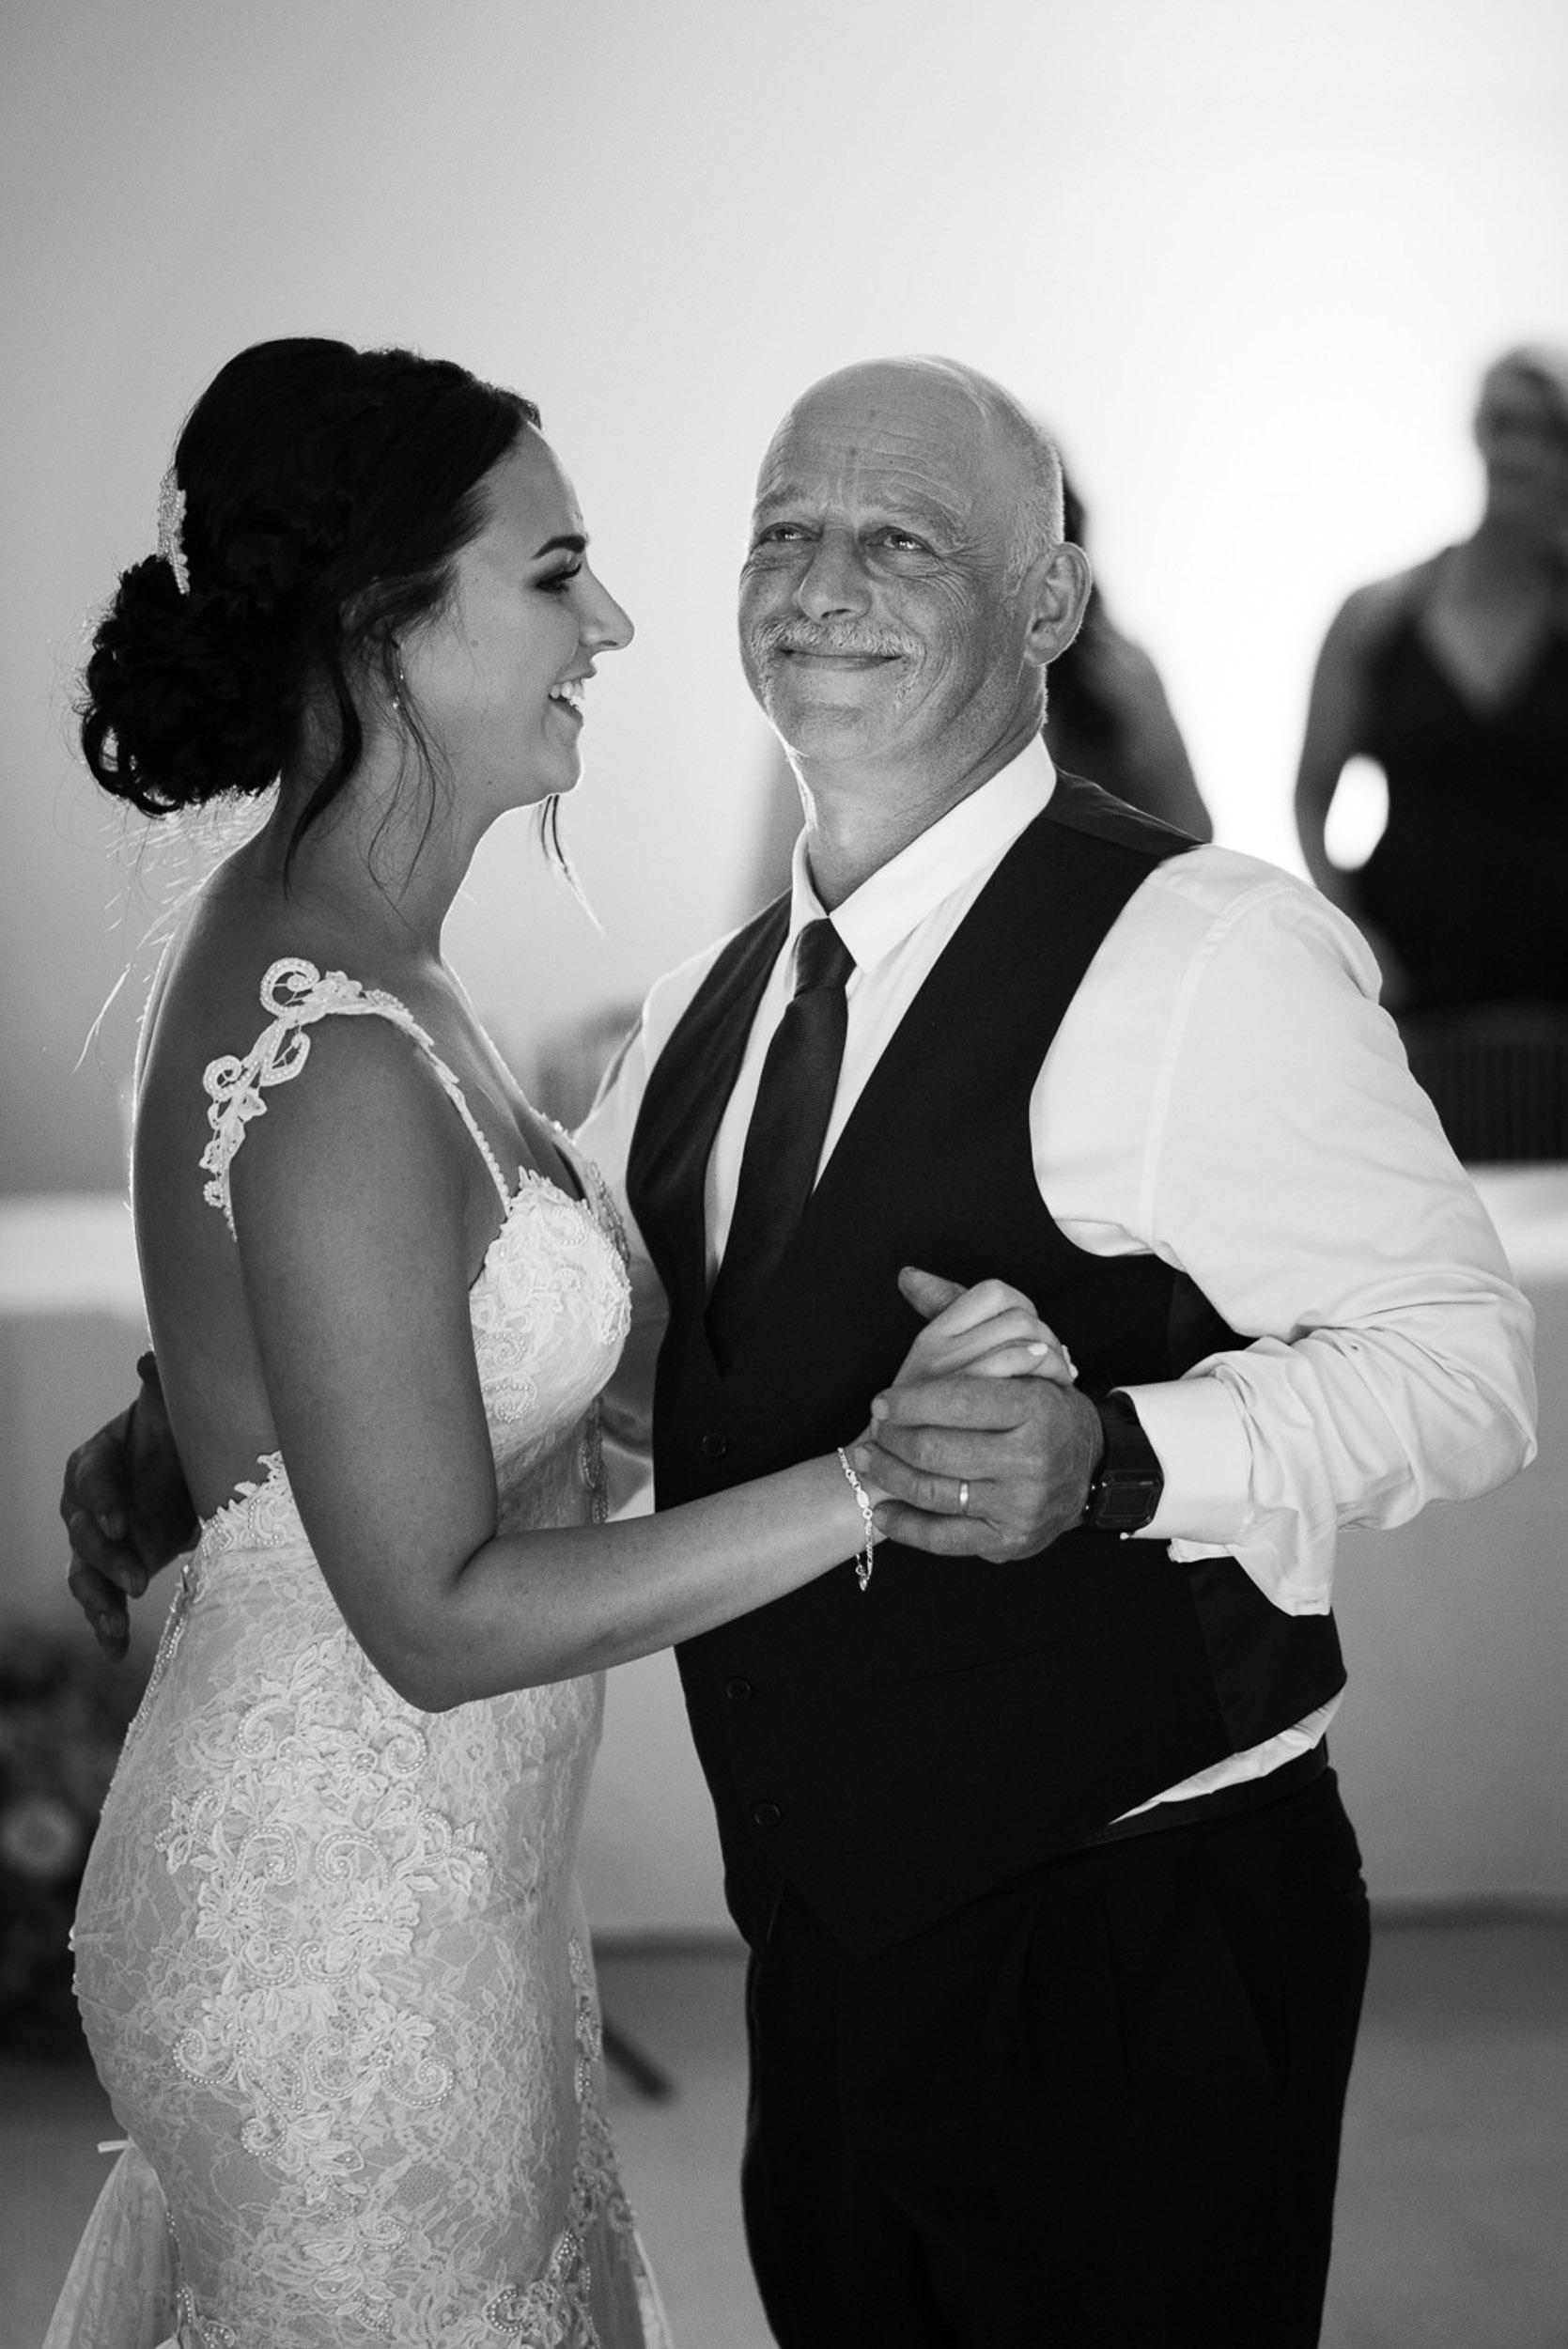 The Raw Photographer - Cairns Wedding Photographer - Fitzroy Island - Destination Wedding - Bride Dress - Groom Portrait - Queensland-48.jpg